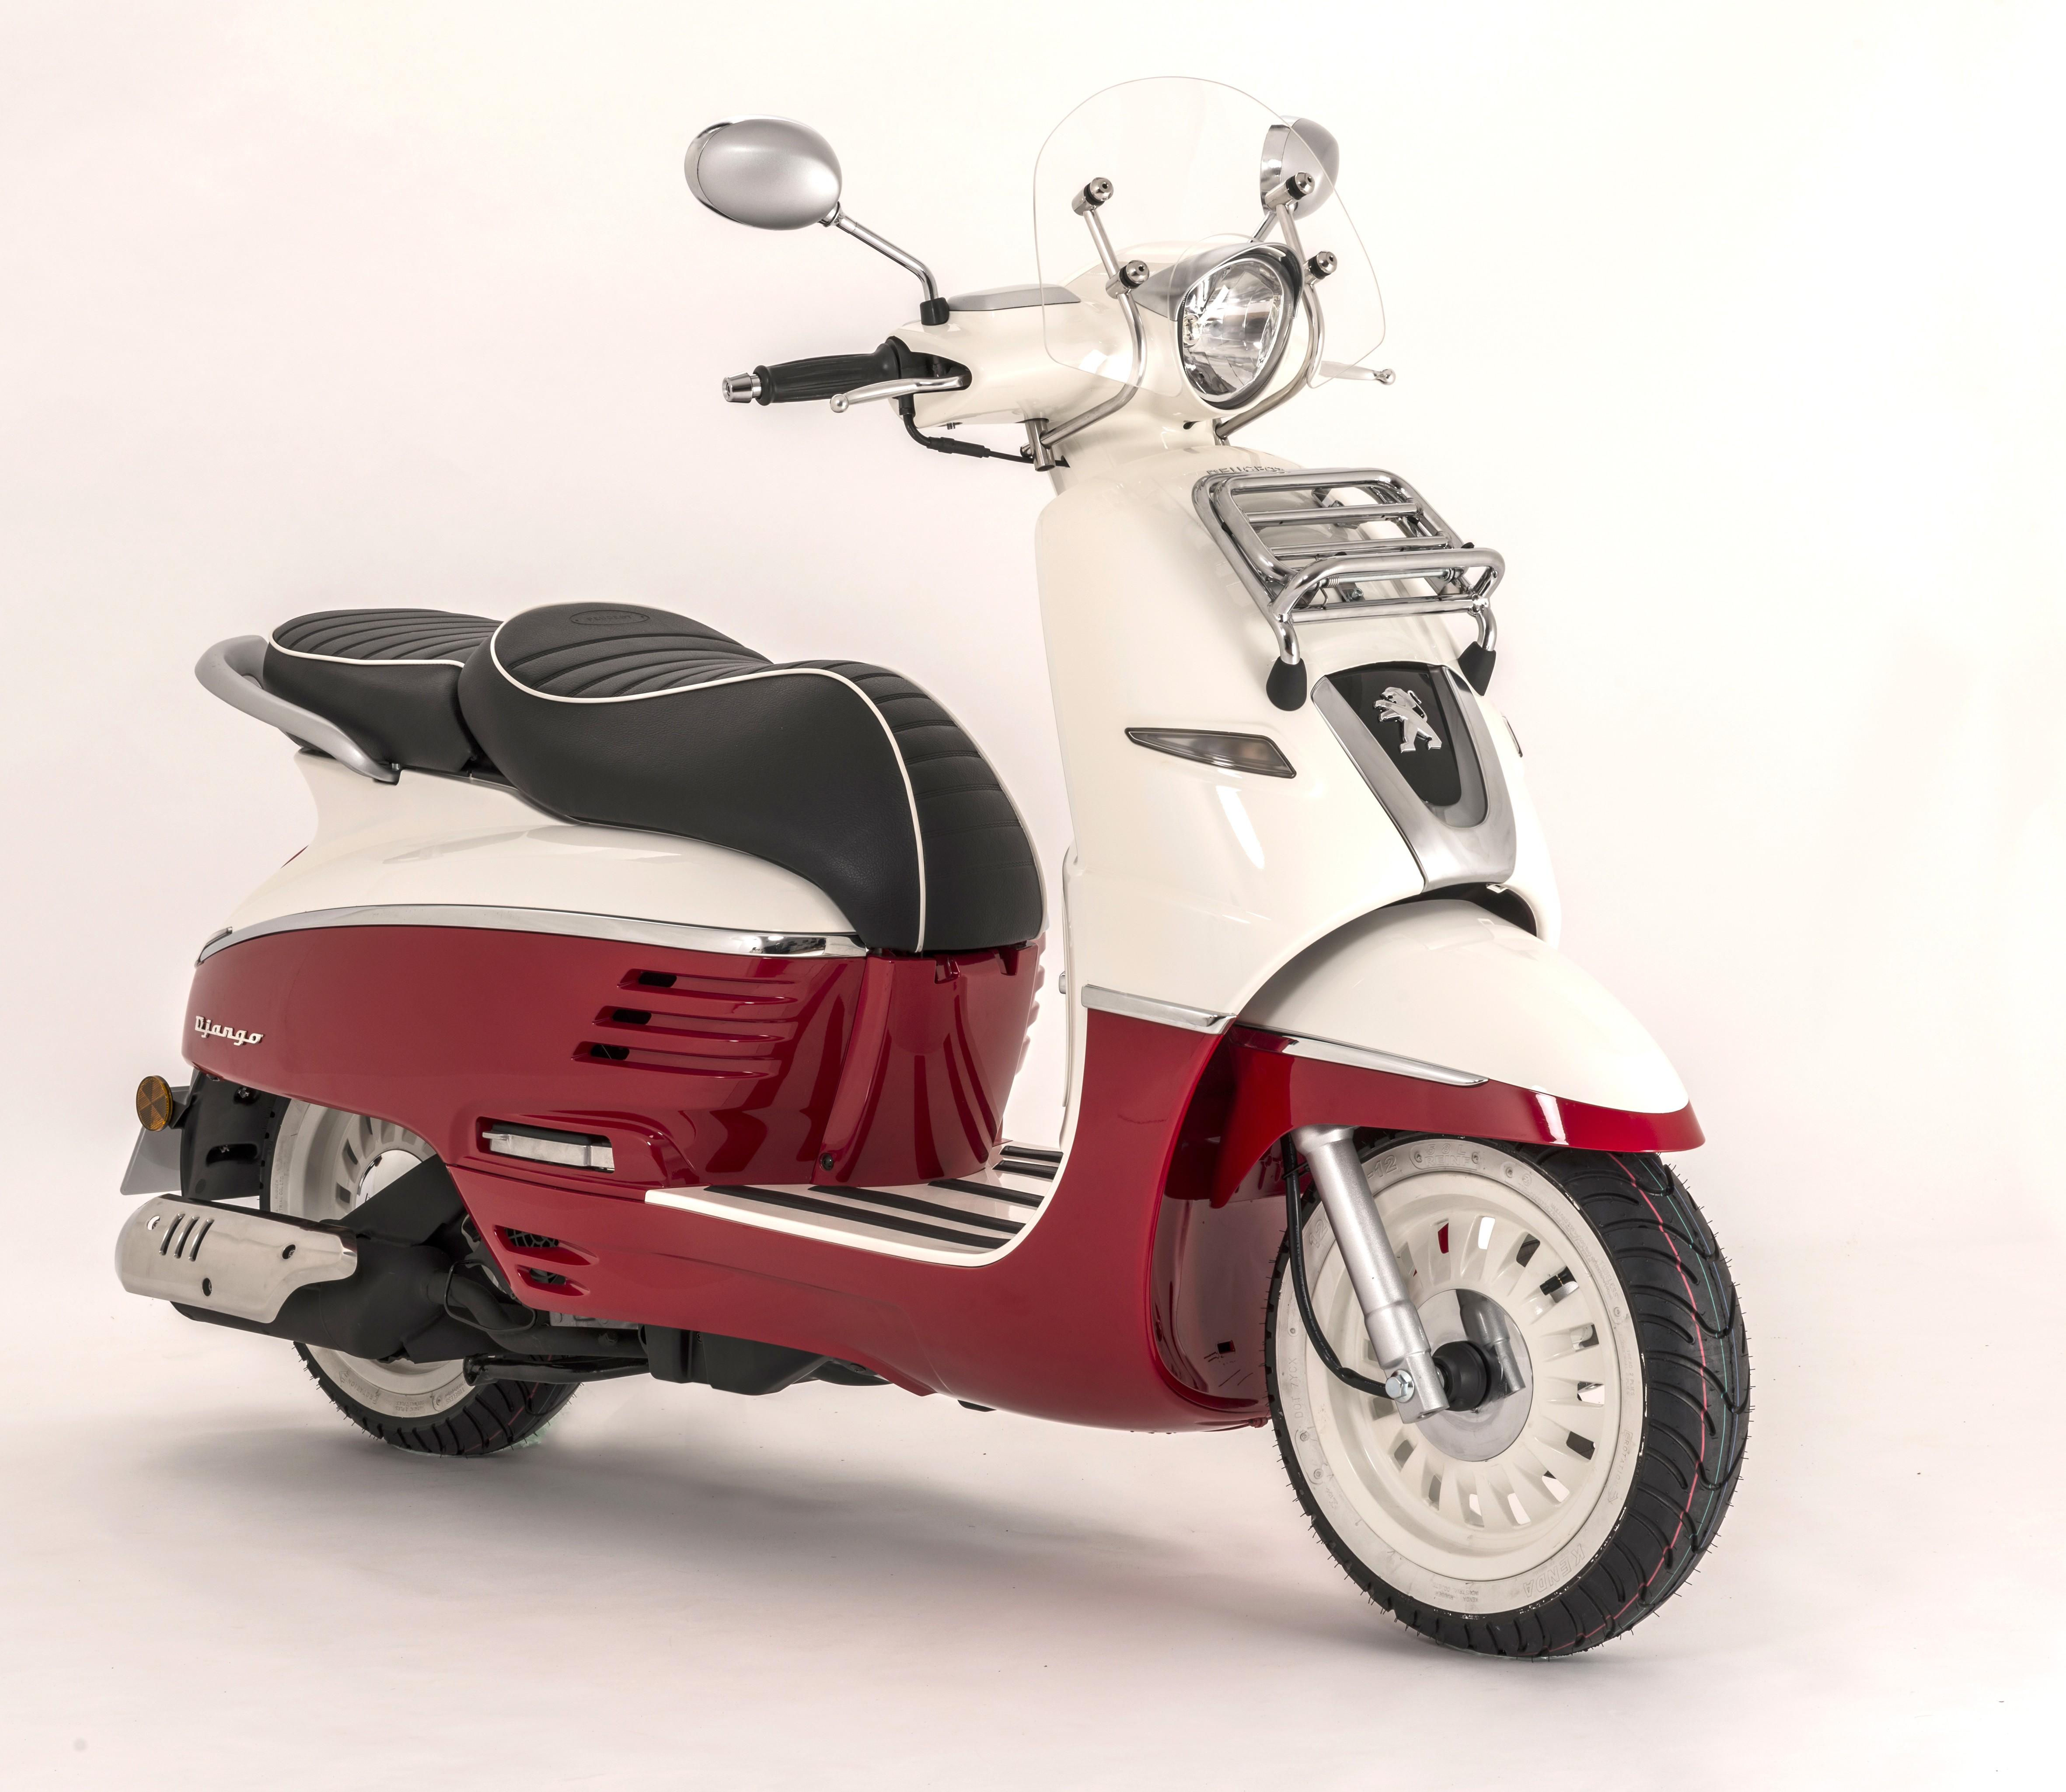 moped butik malmö